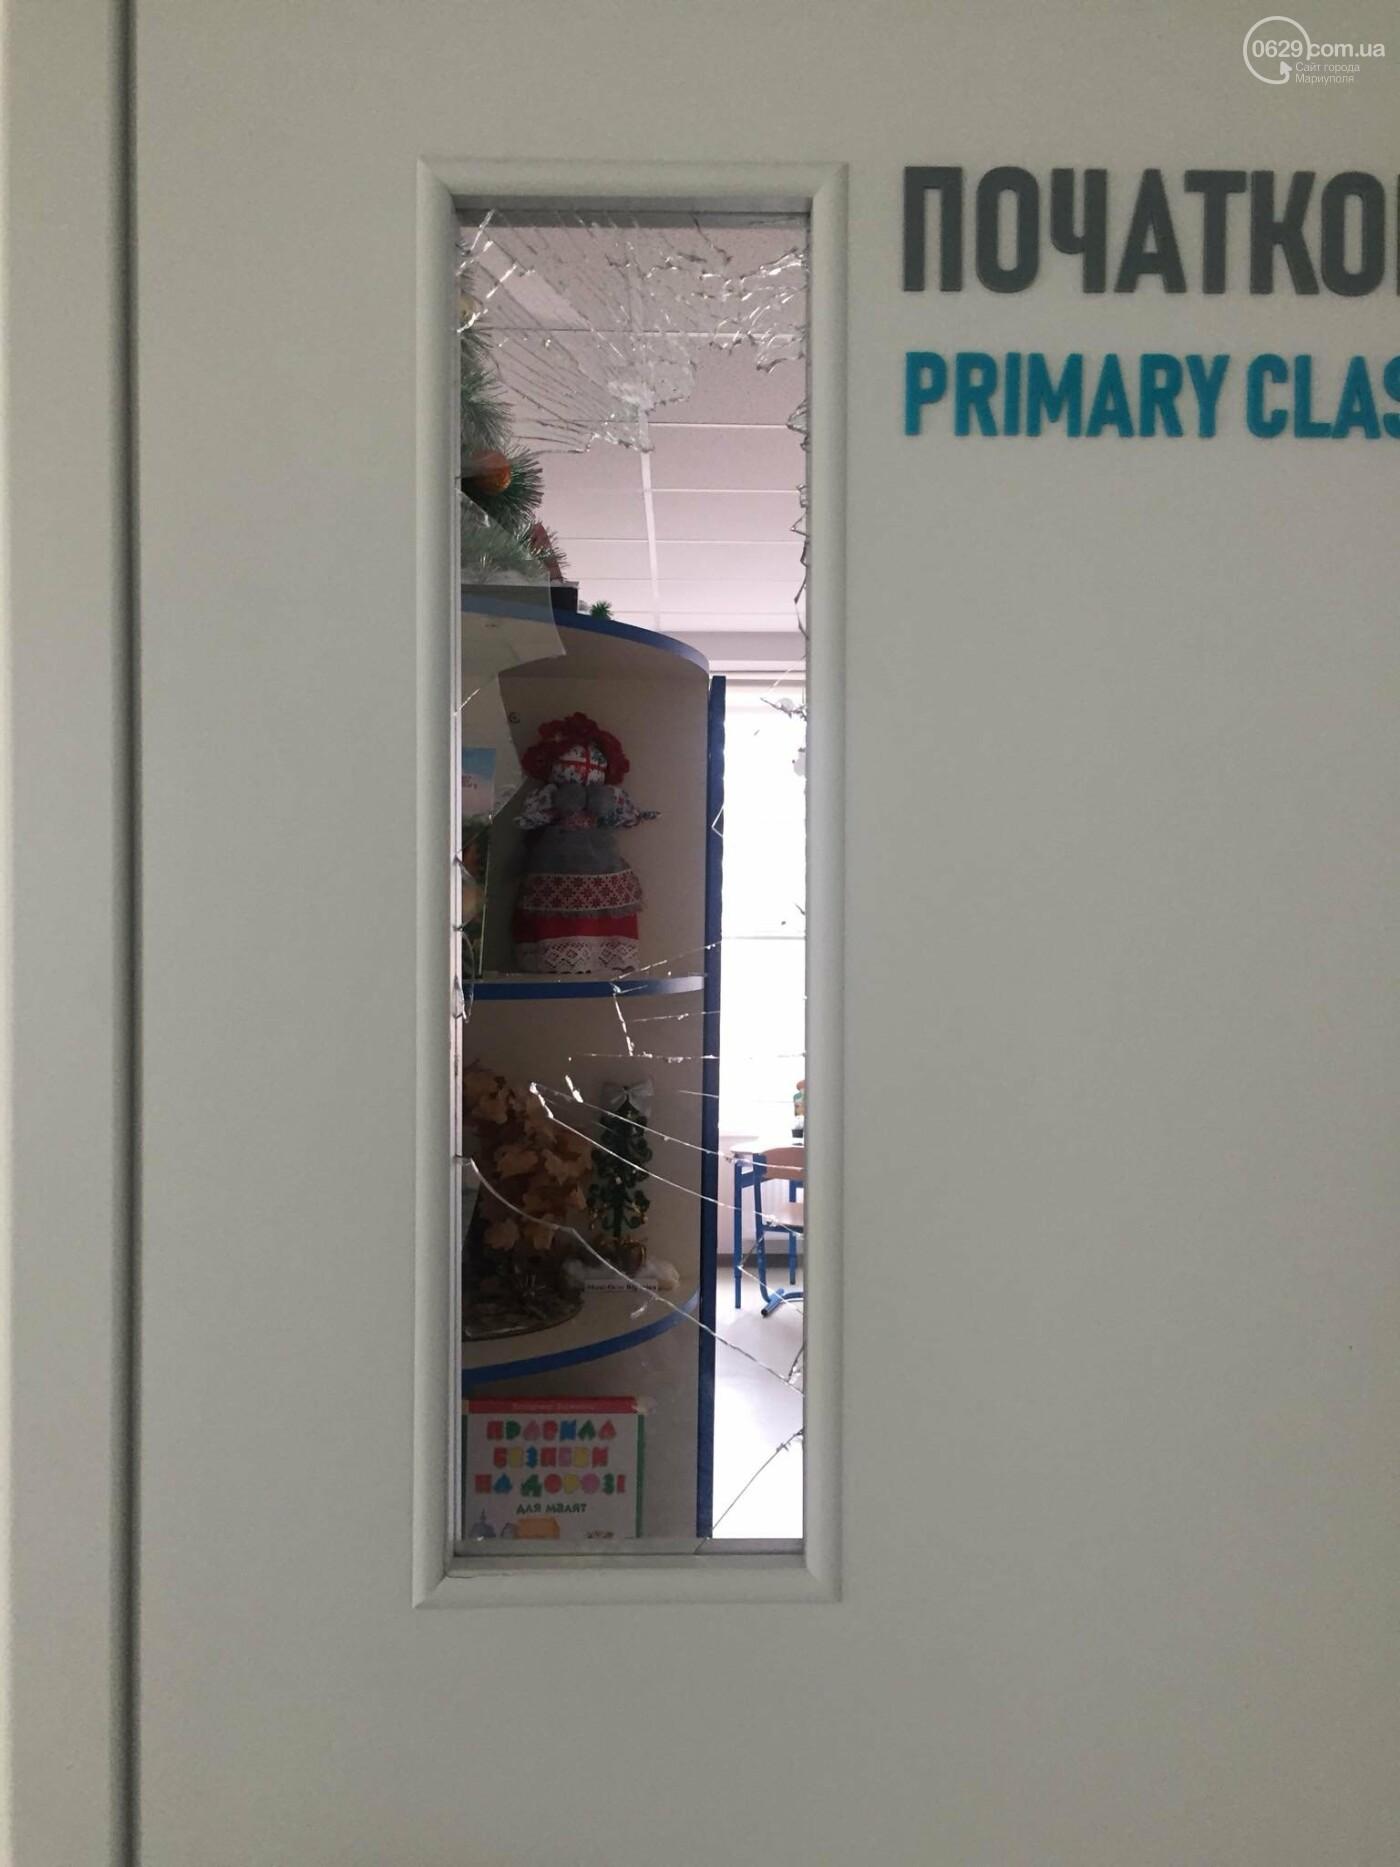 В  Мариуполе неадекватный хулиган разгромил школу, - ДОПОЛНЕНО, ФОТО, фото-2